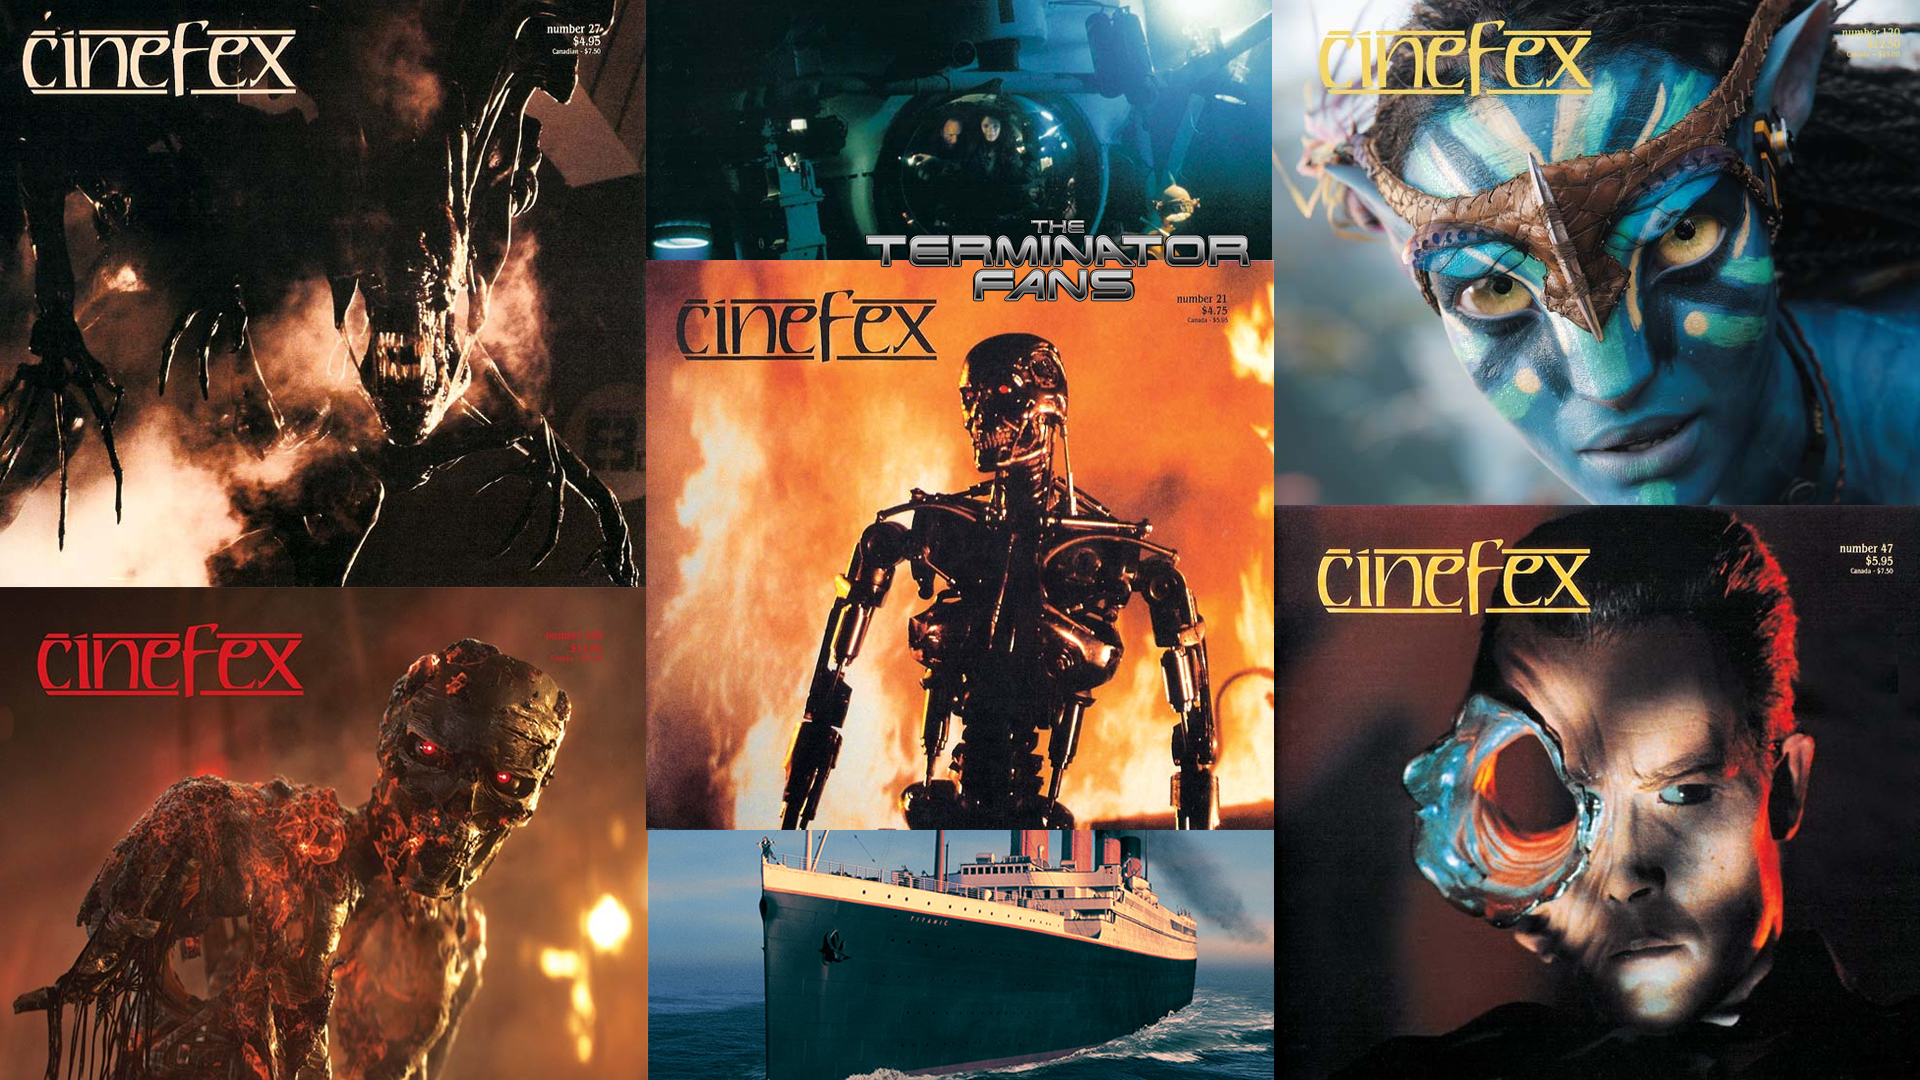 Cinefex James Cameron Movies Terminator Covers